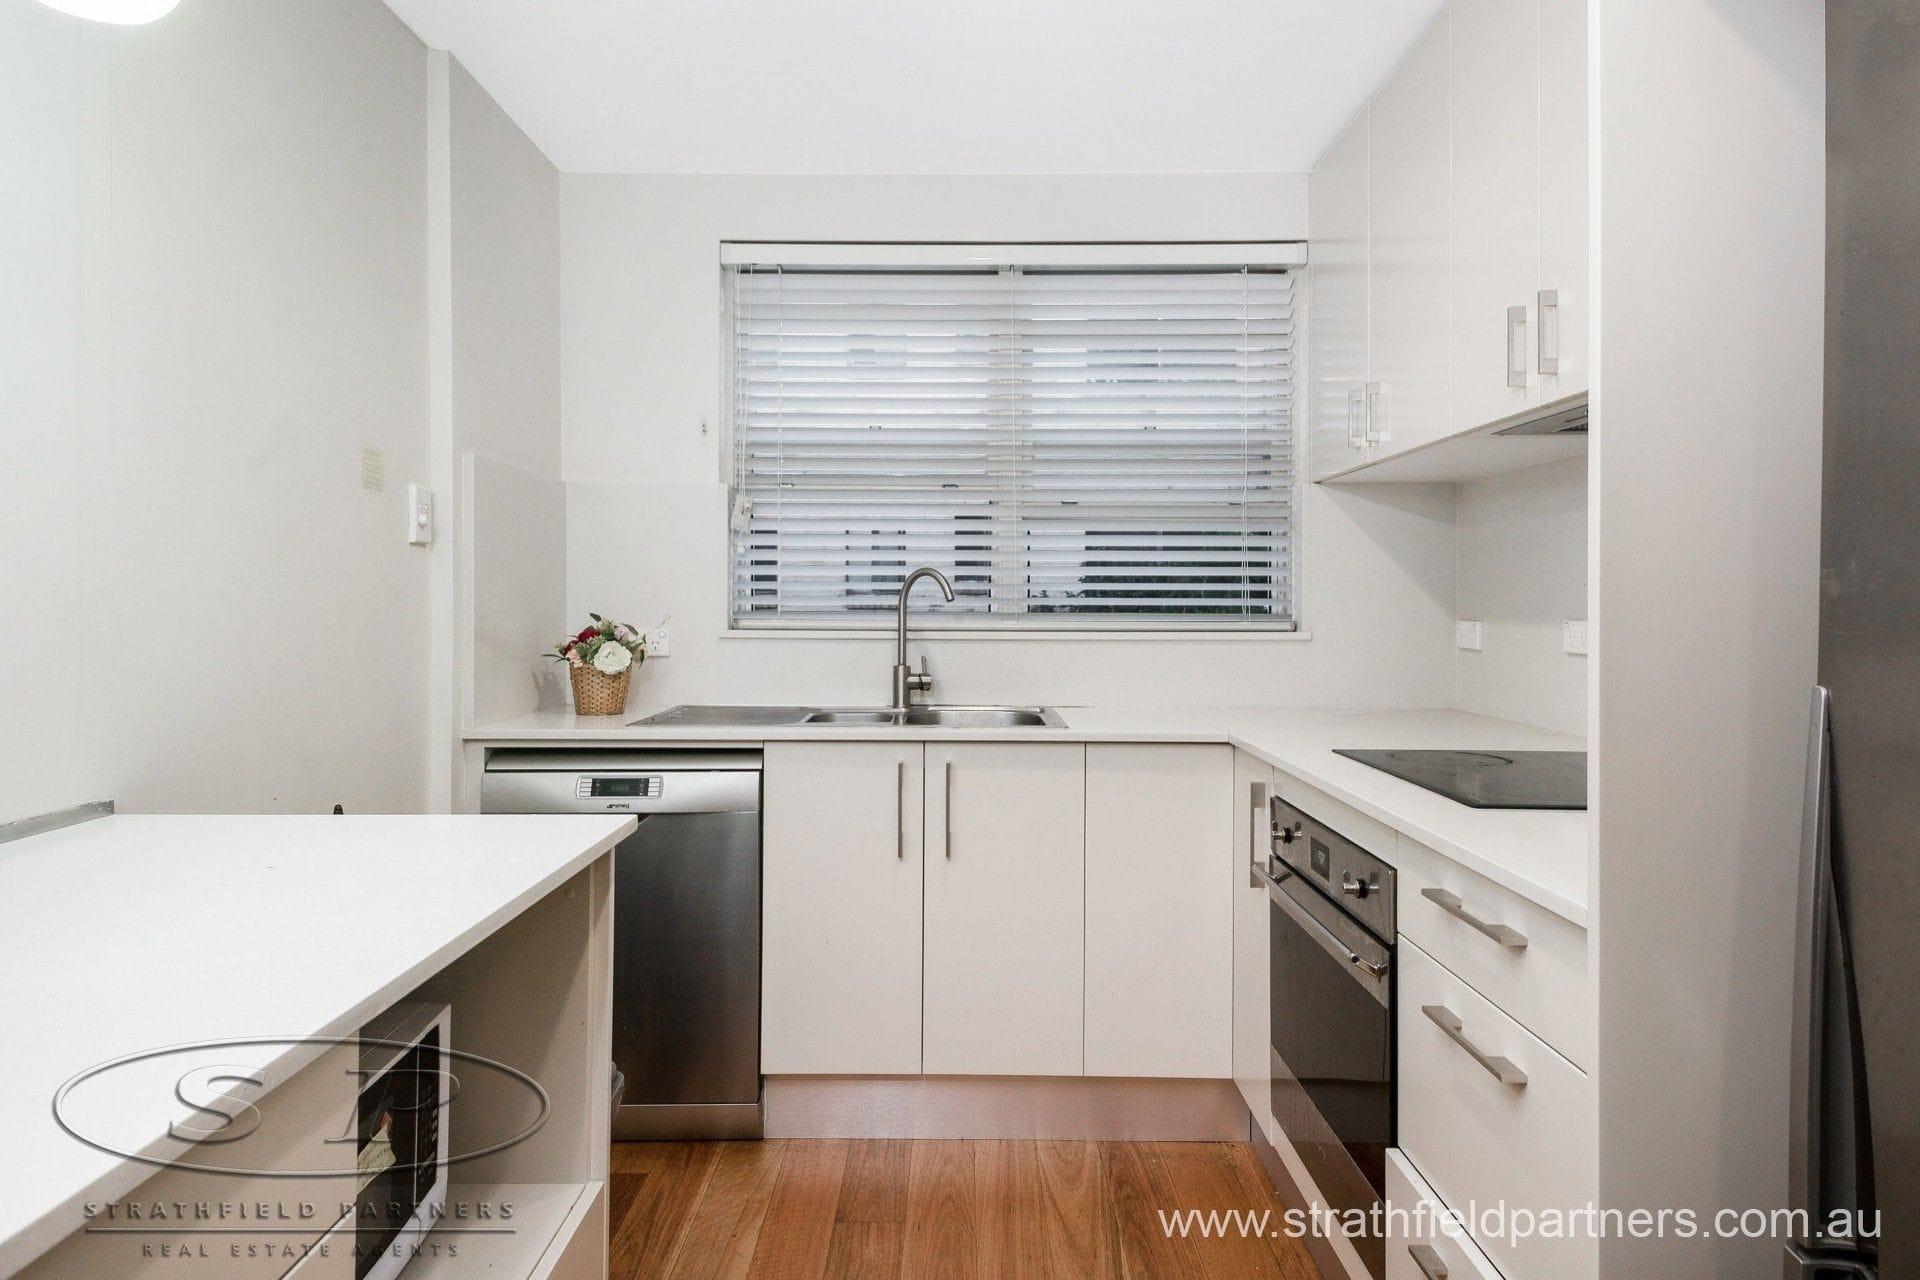 Property 5/70-74 The Boulevarde, Strathfield NSW 2135 IMAGE